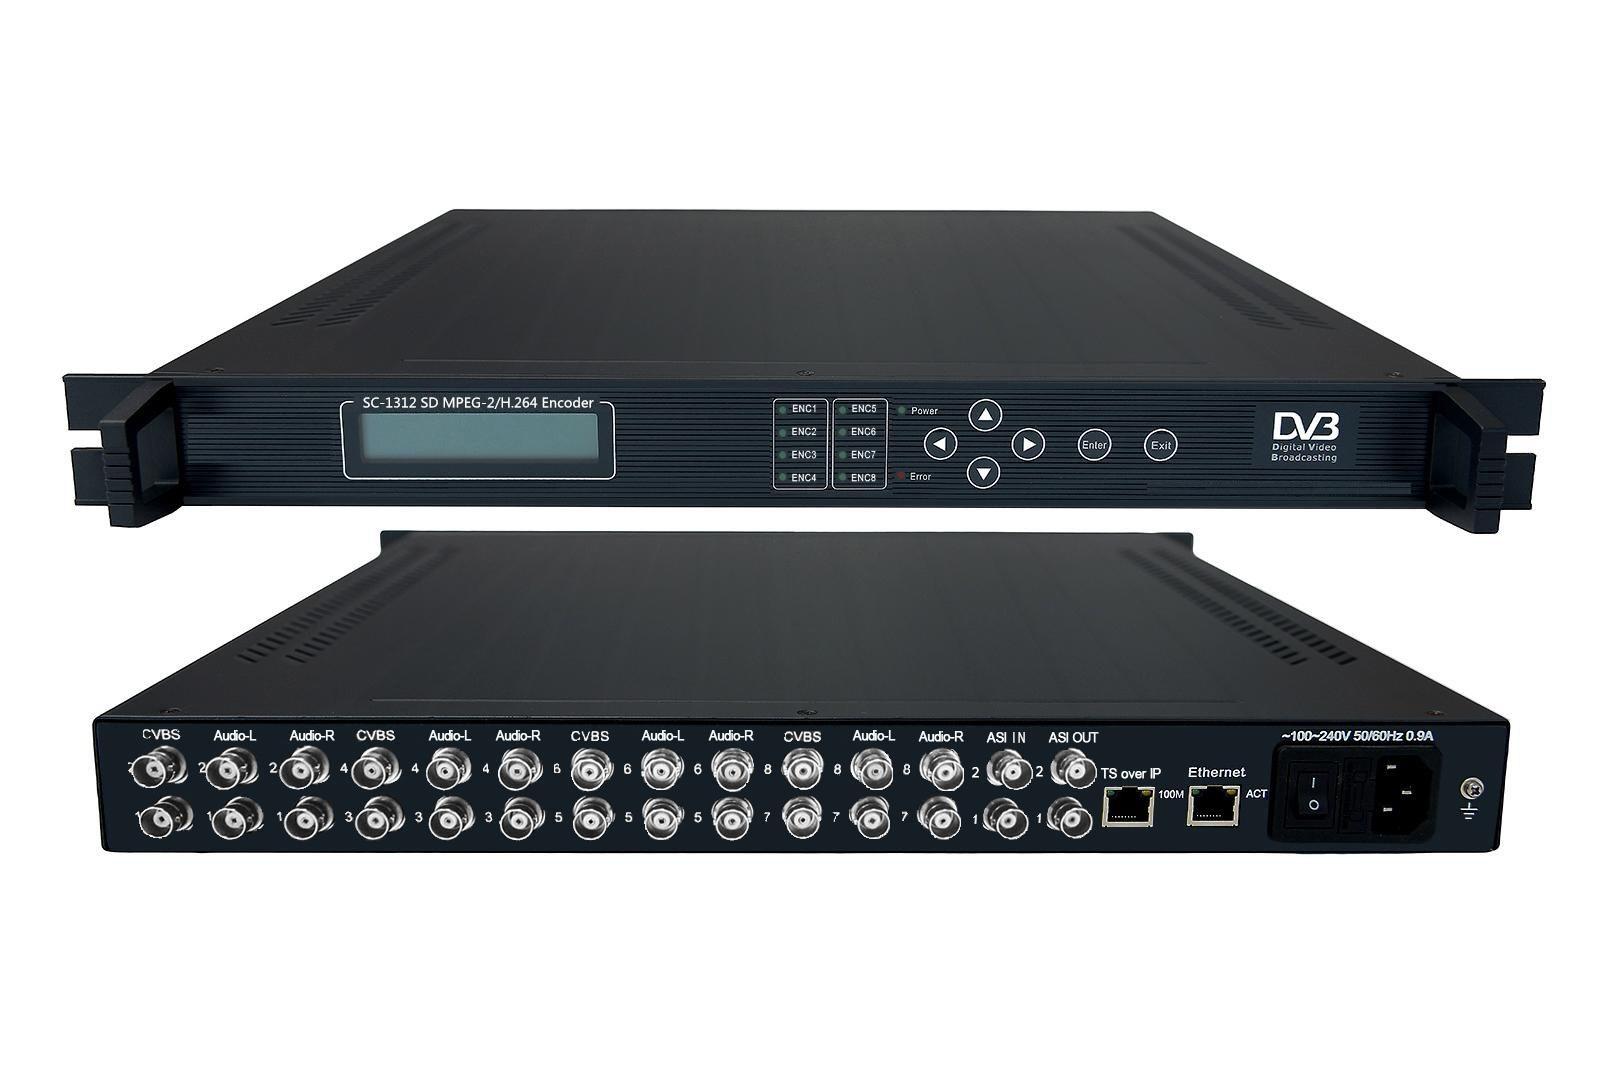 8IN1 MPEG-2-H.264 encoder